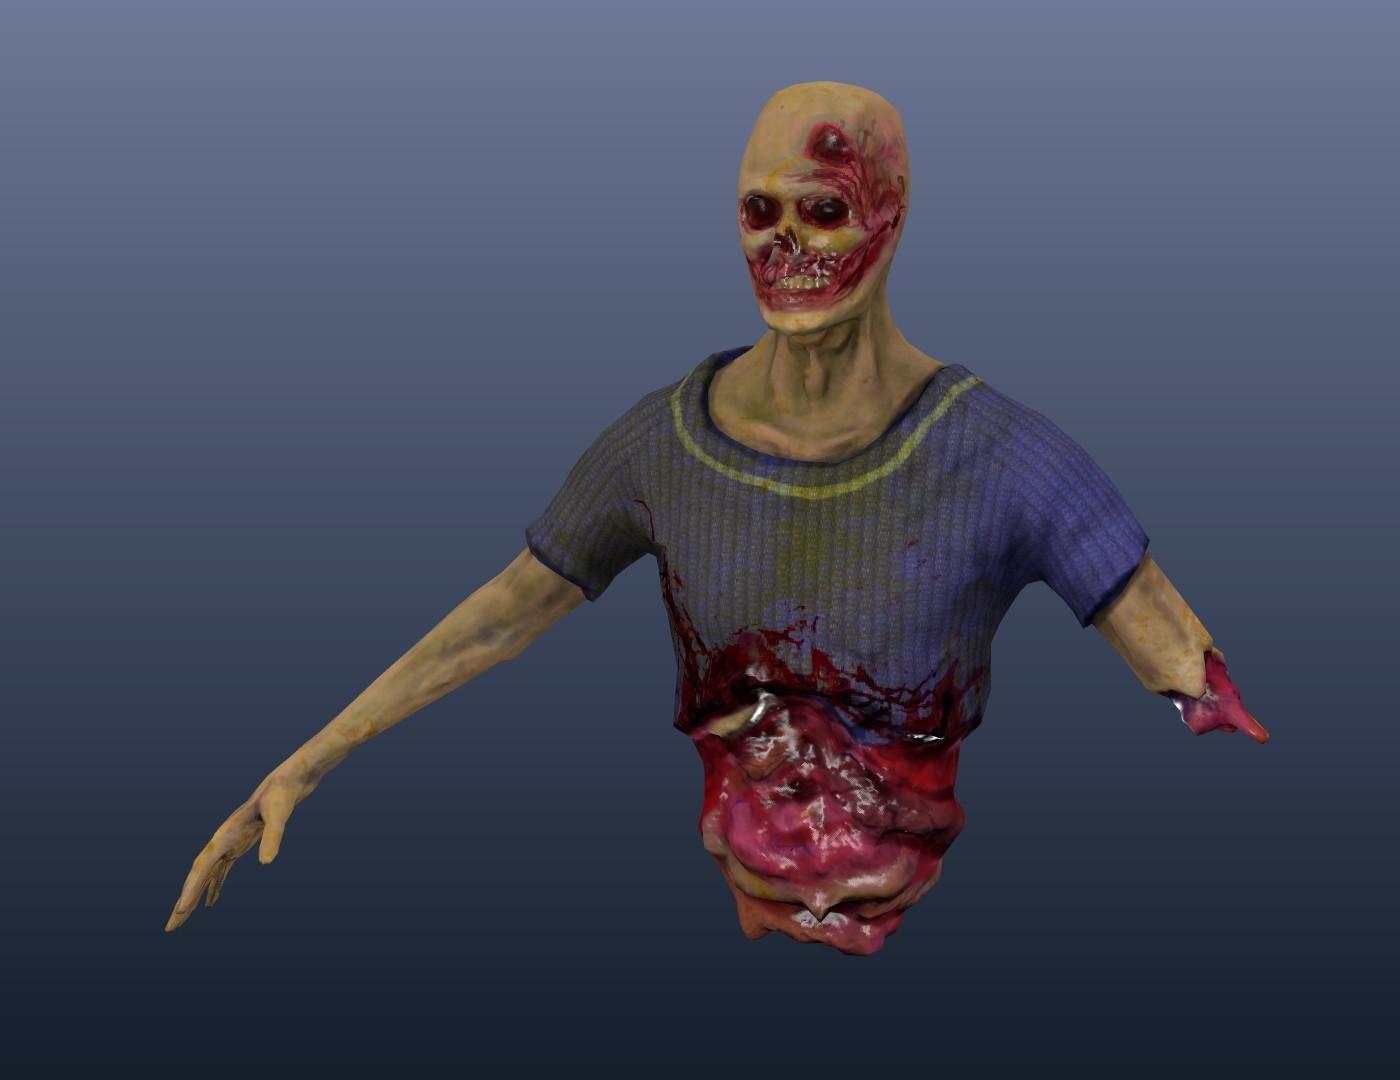 Gary myers torso pose